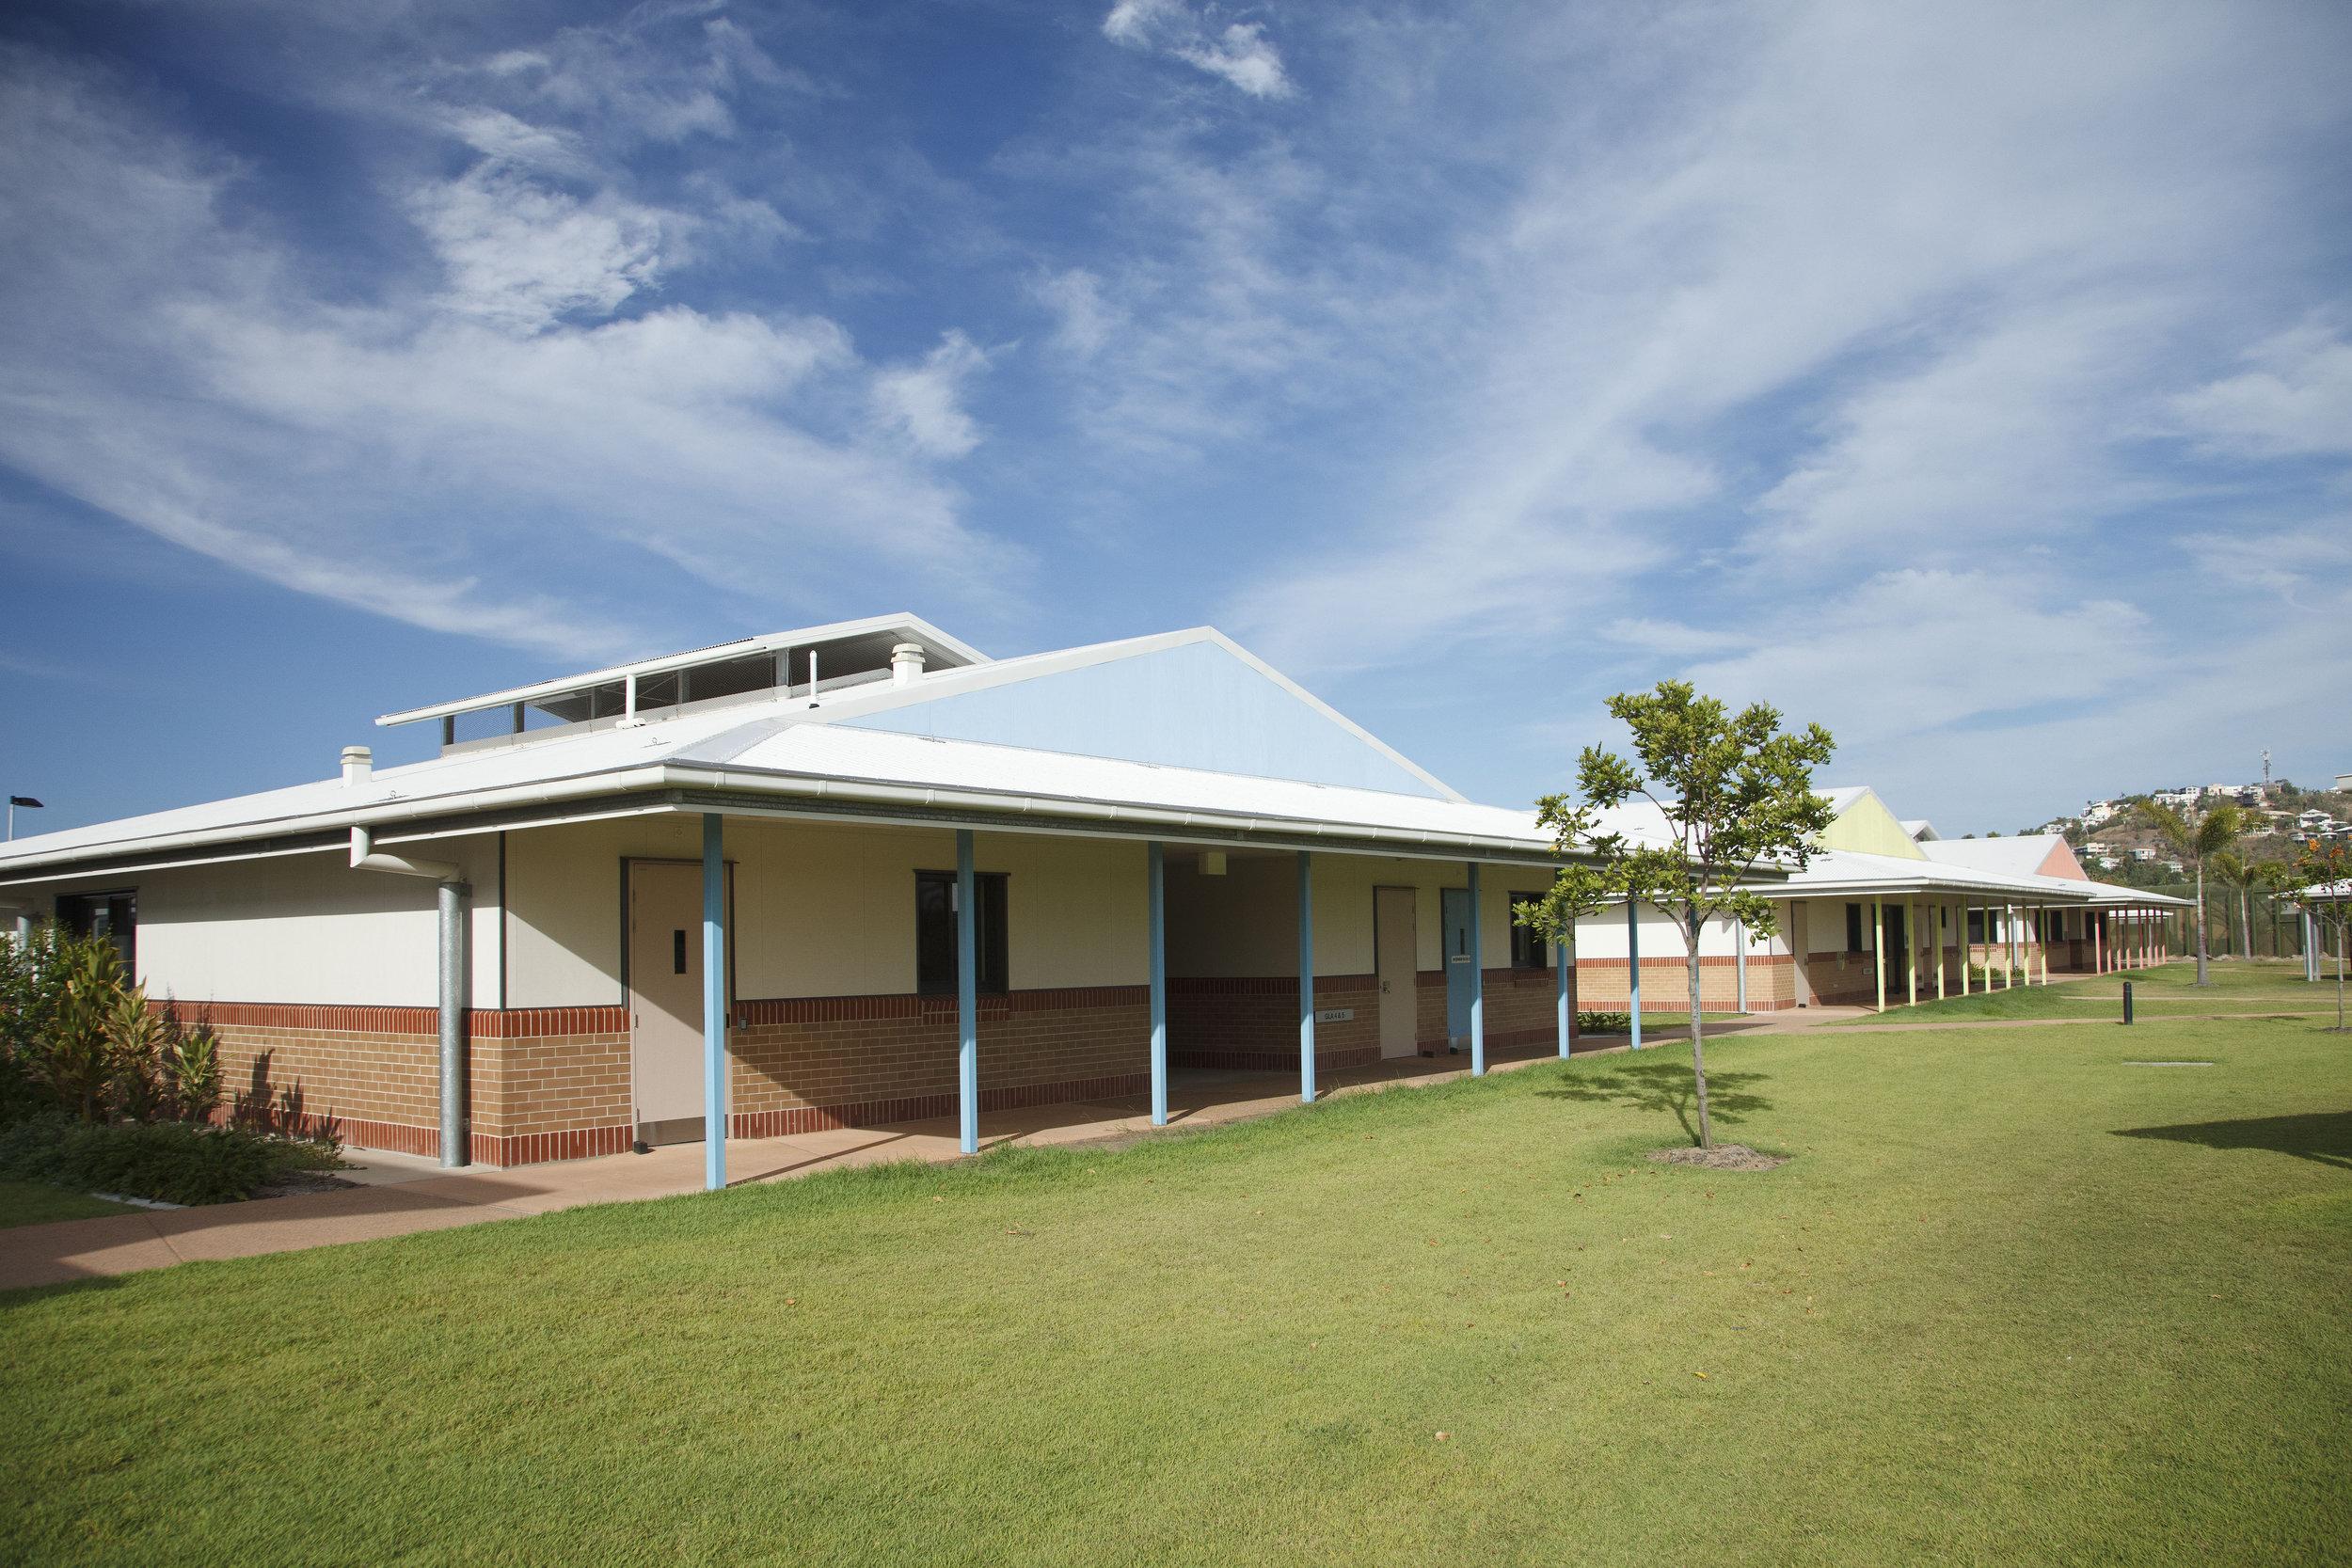 Far-north-qld-youth-detention-guymer-bailey-landscape-3.jpg